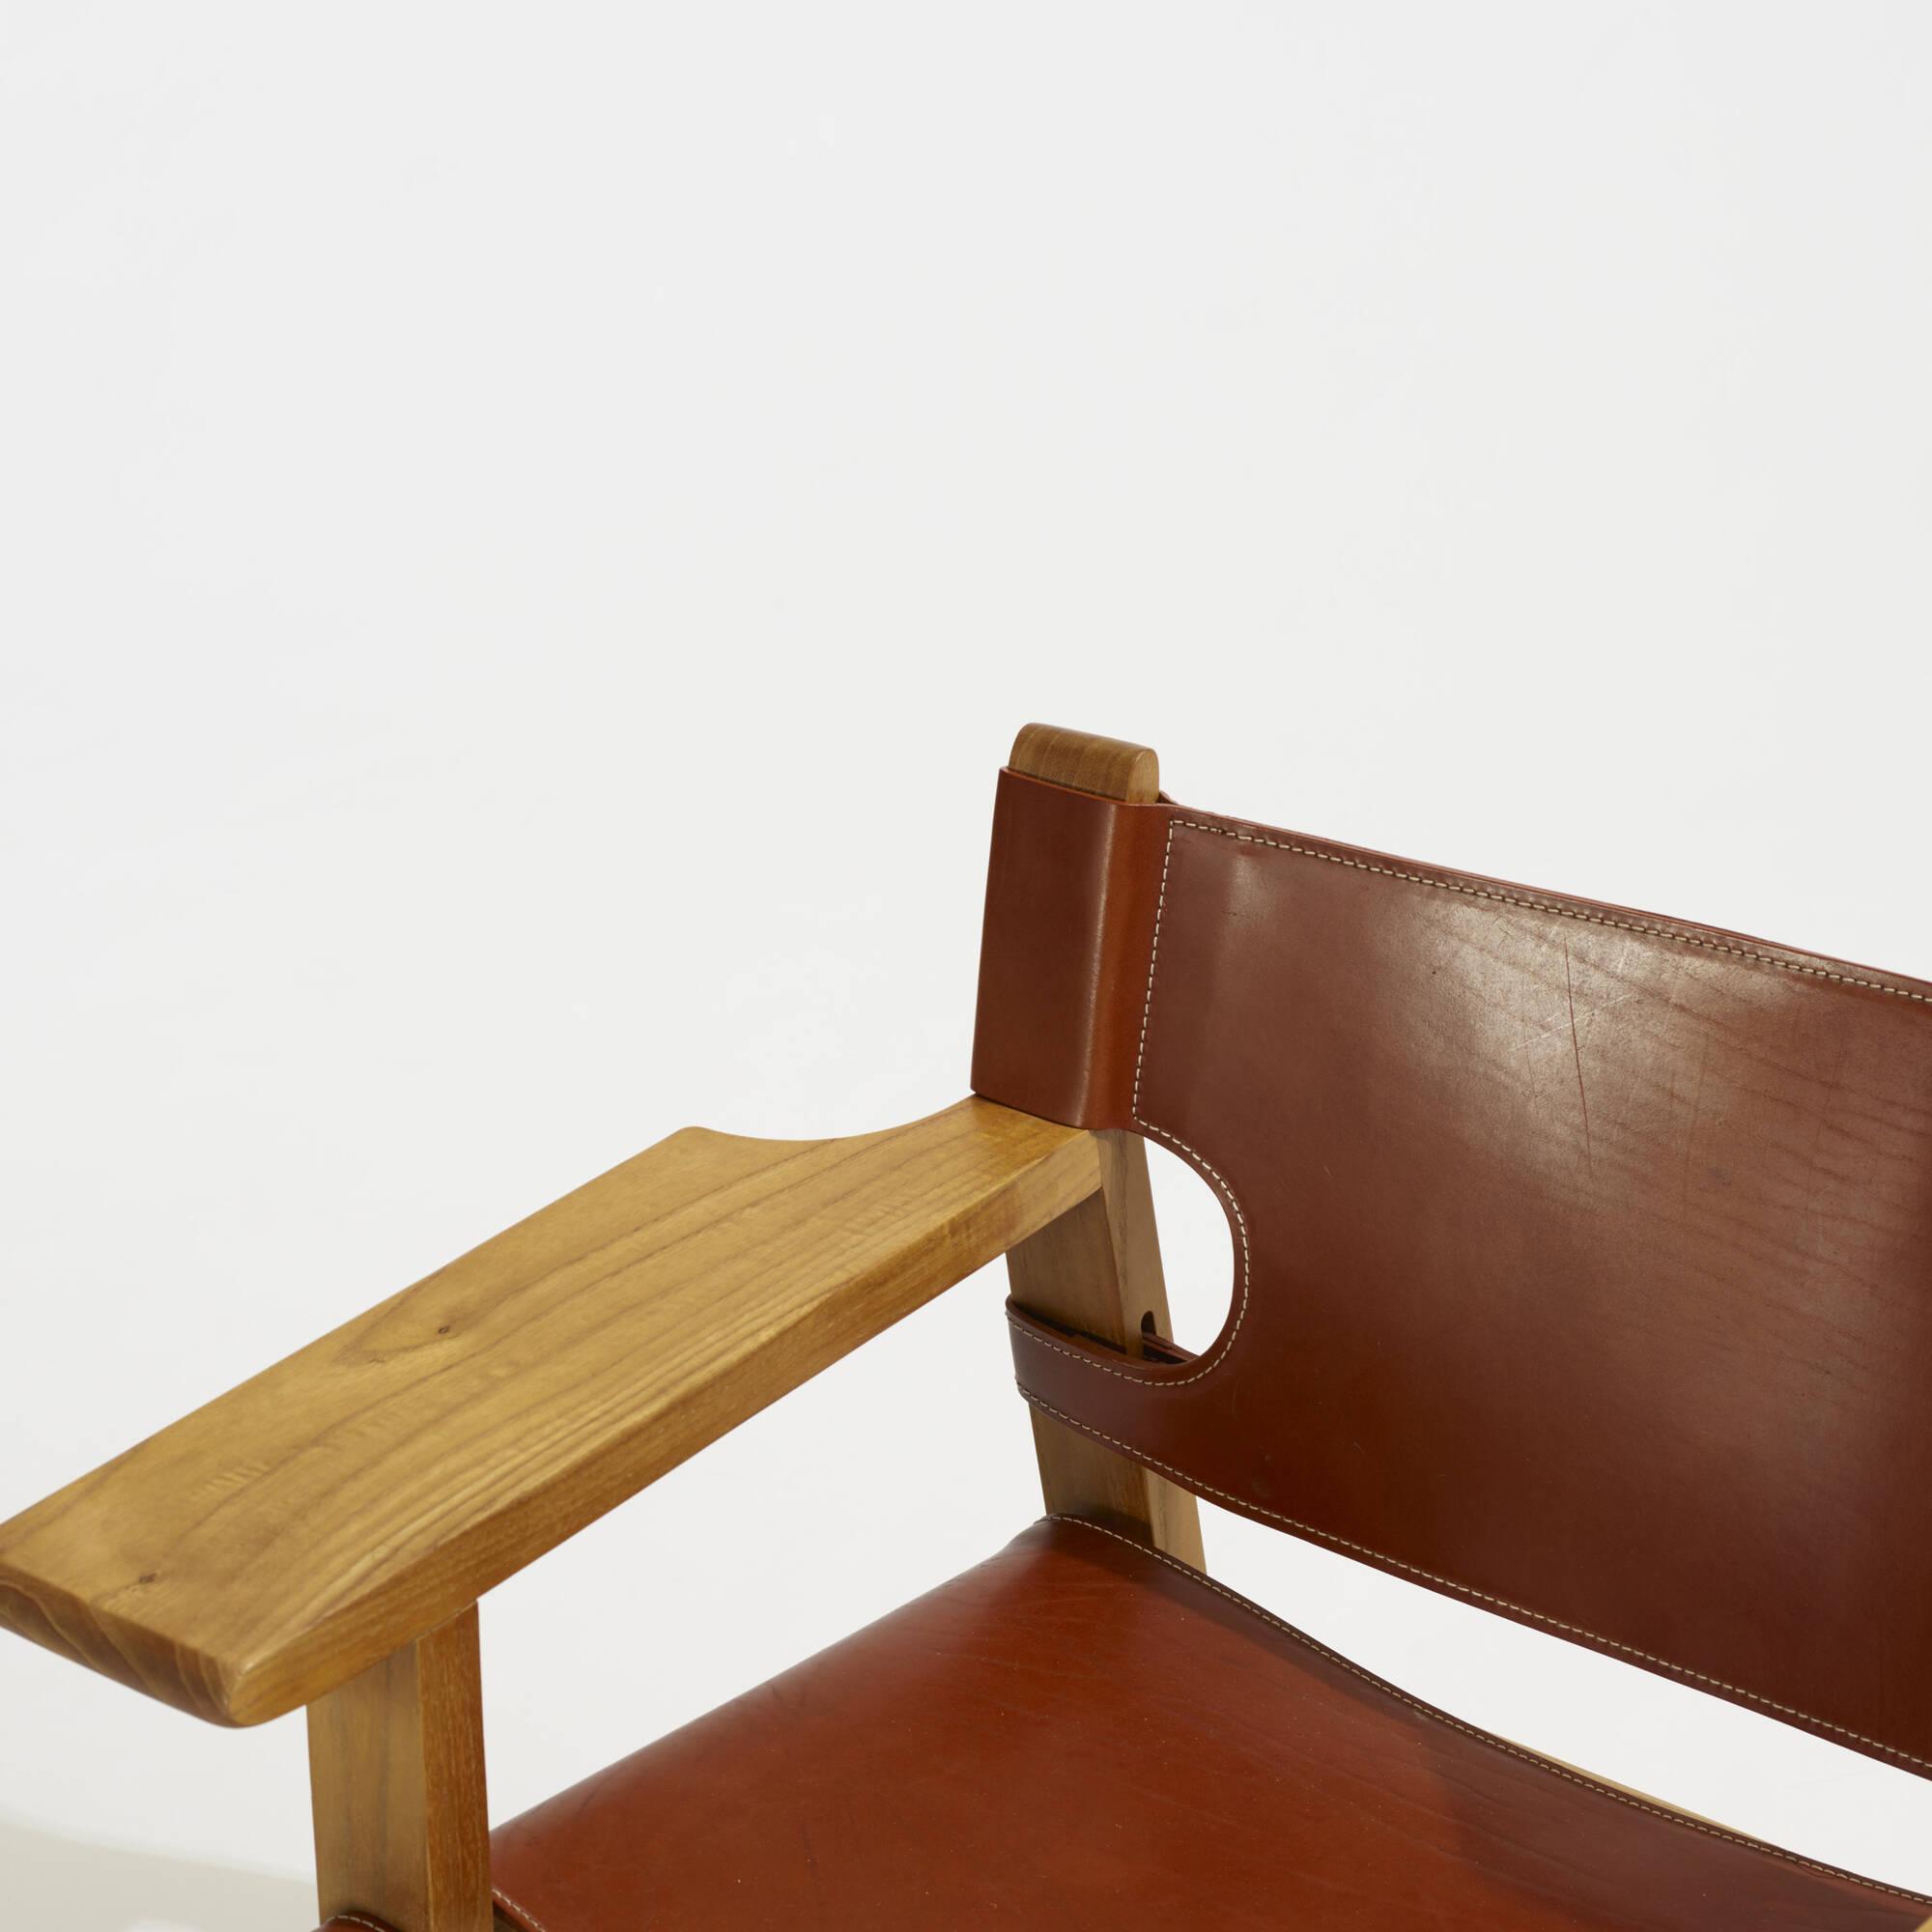 327: Børge Mogensen / Spanish chairs, pair (3 of 3)